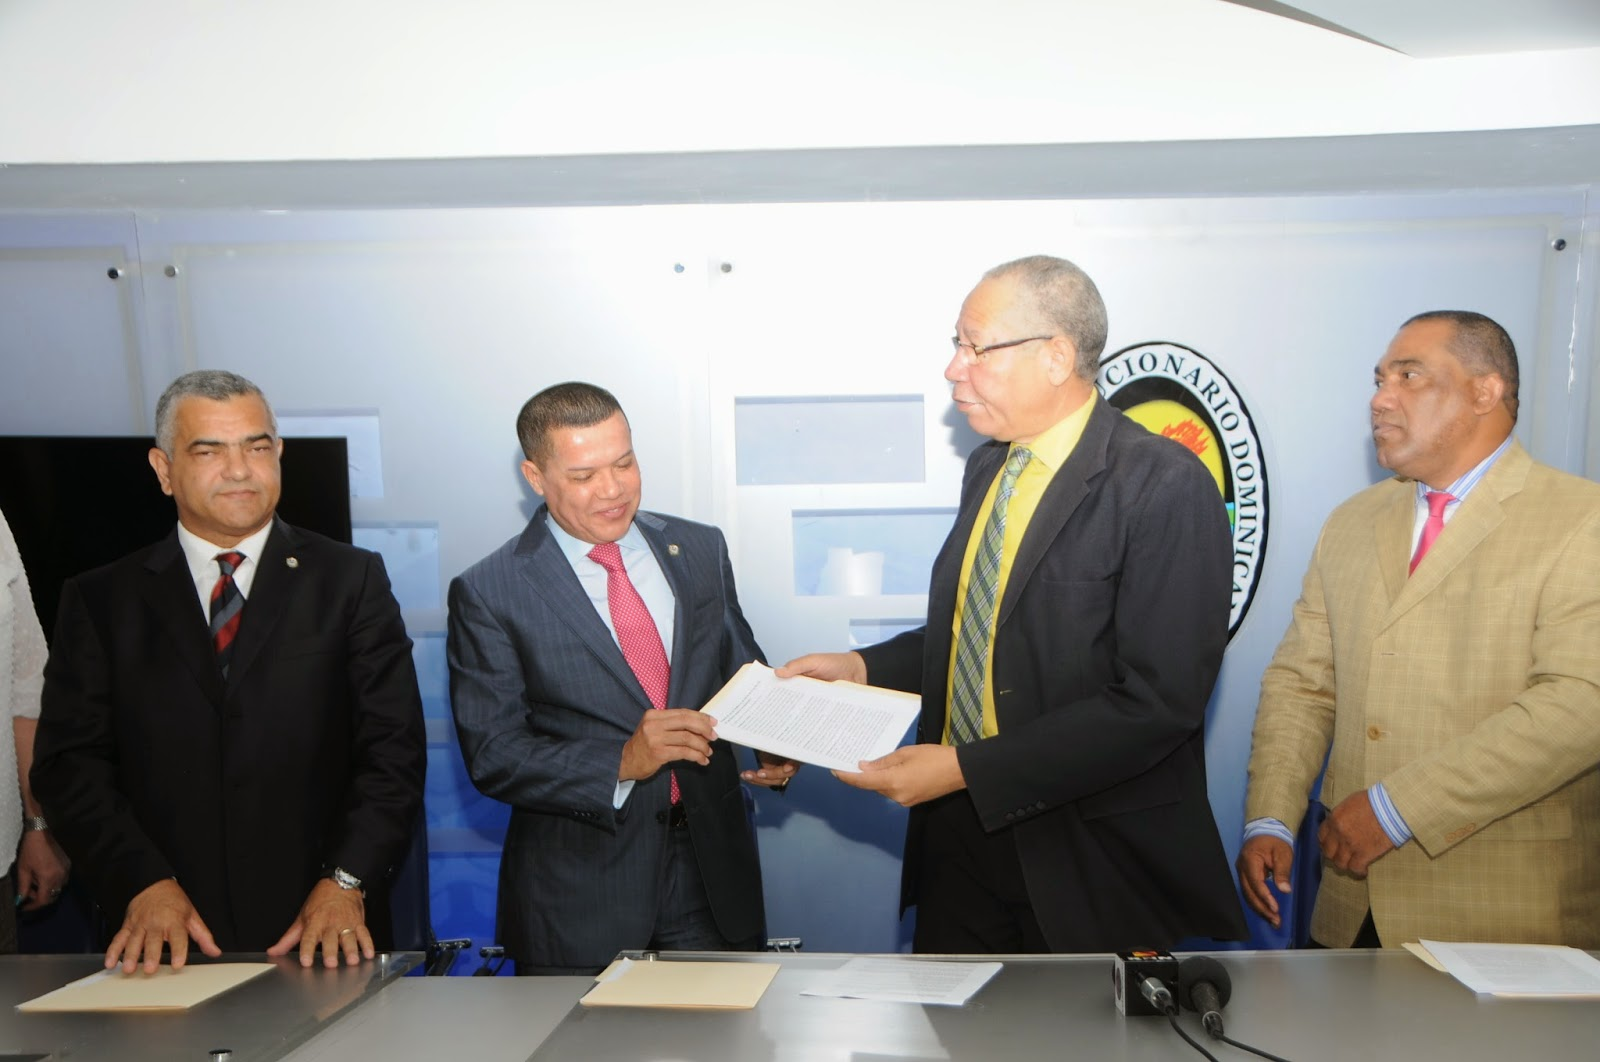 PRD busca aprobar ley para que no sumen votos de distritos municipales a los de municipios